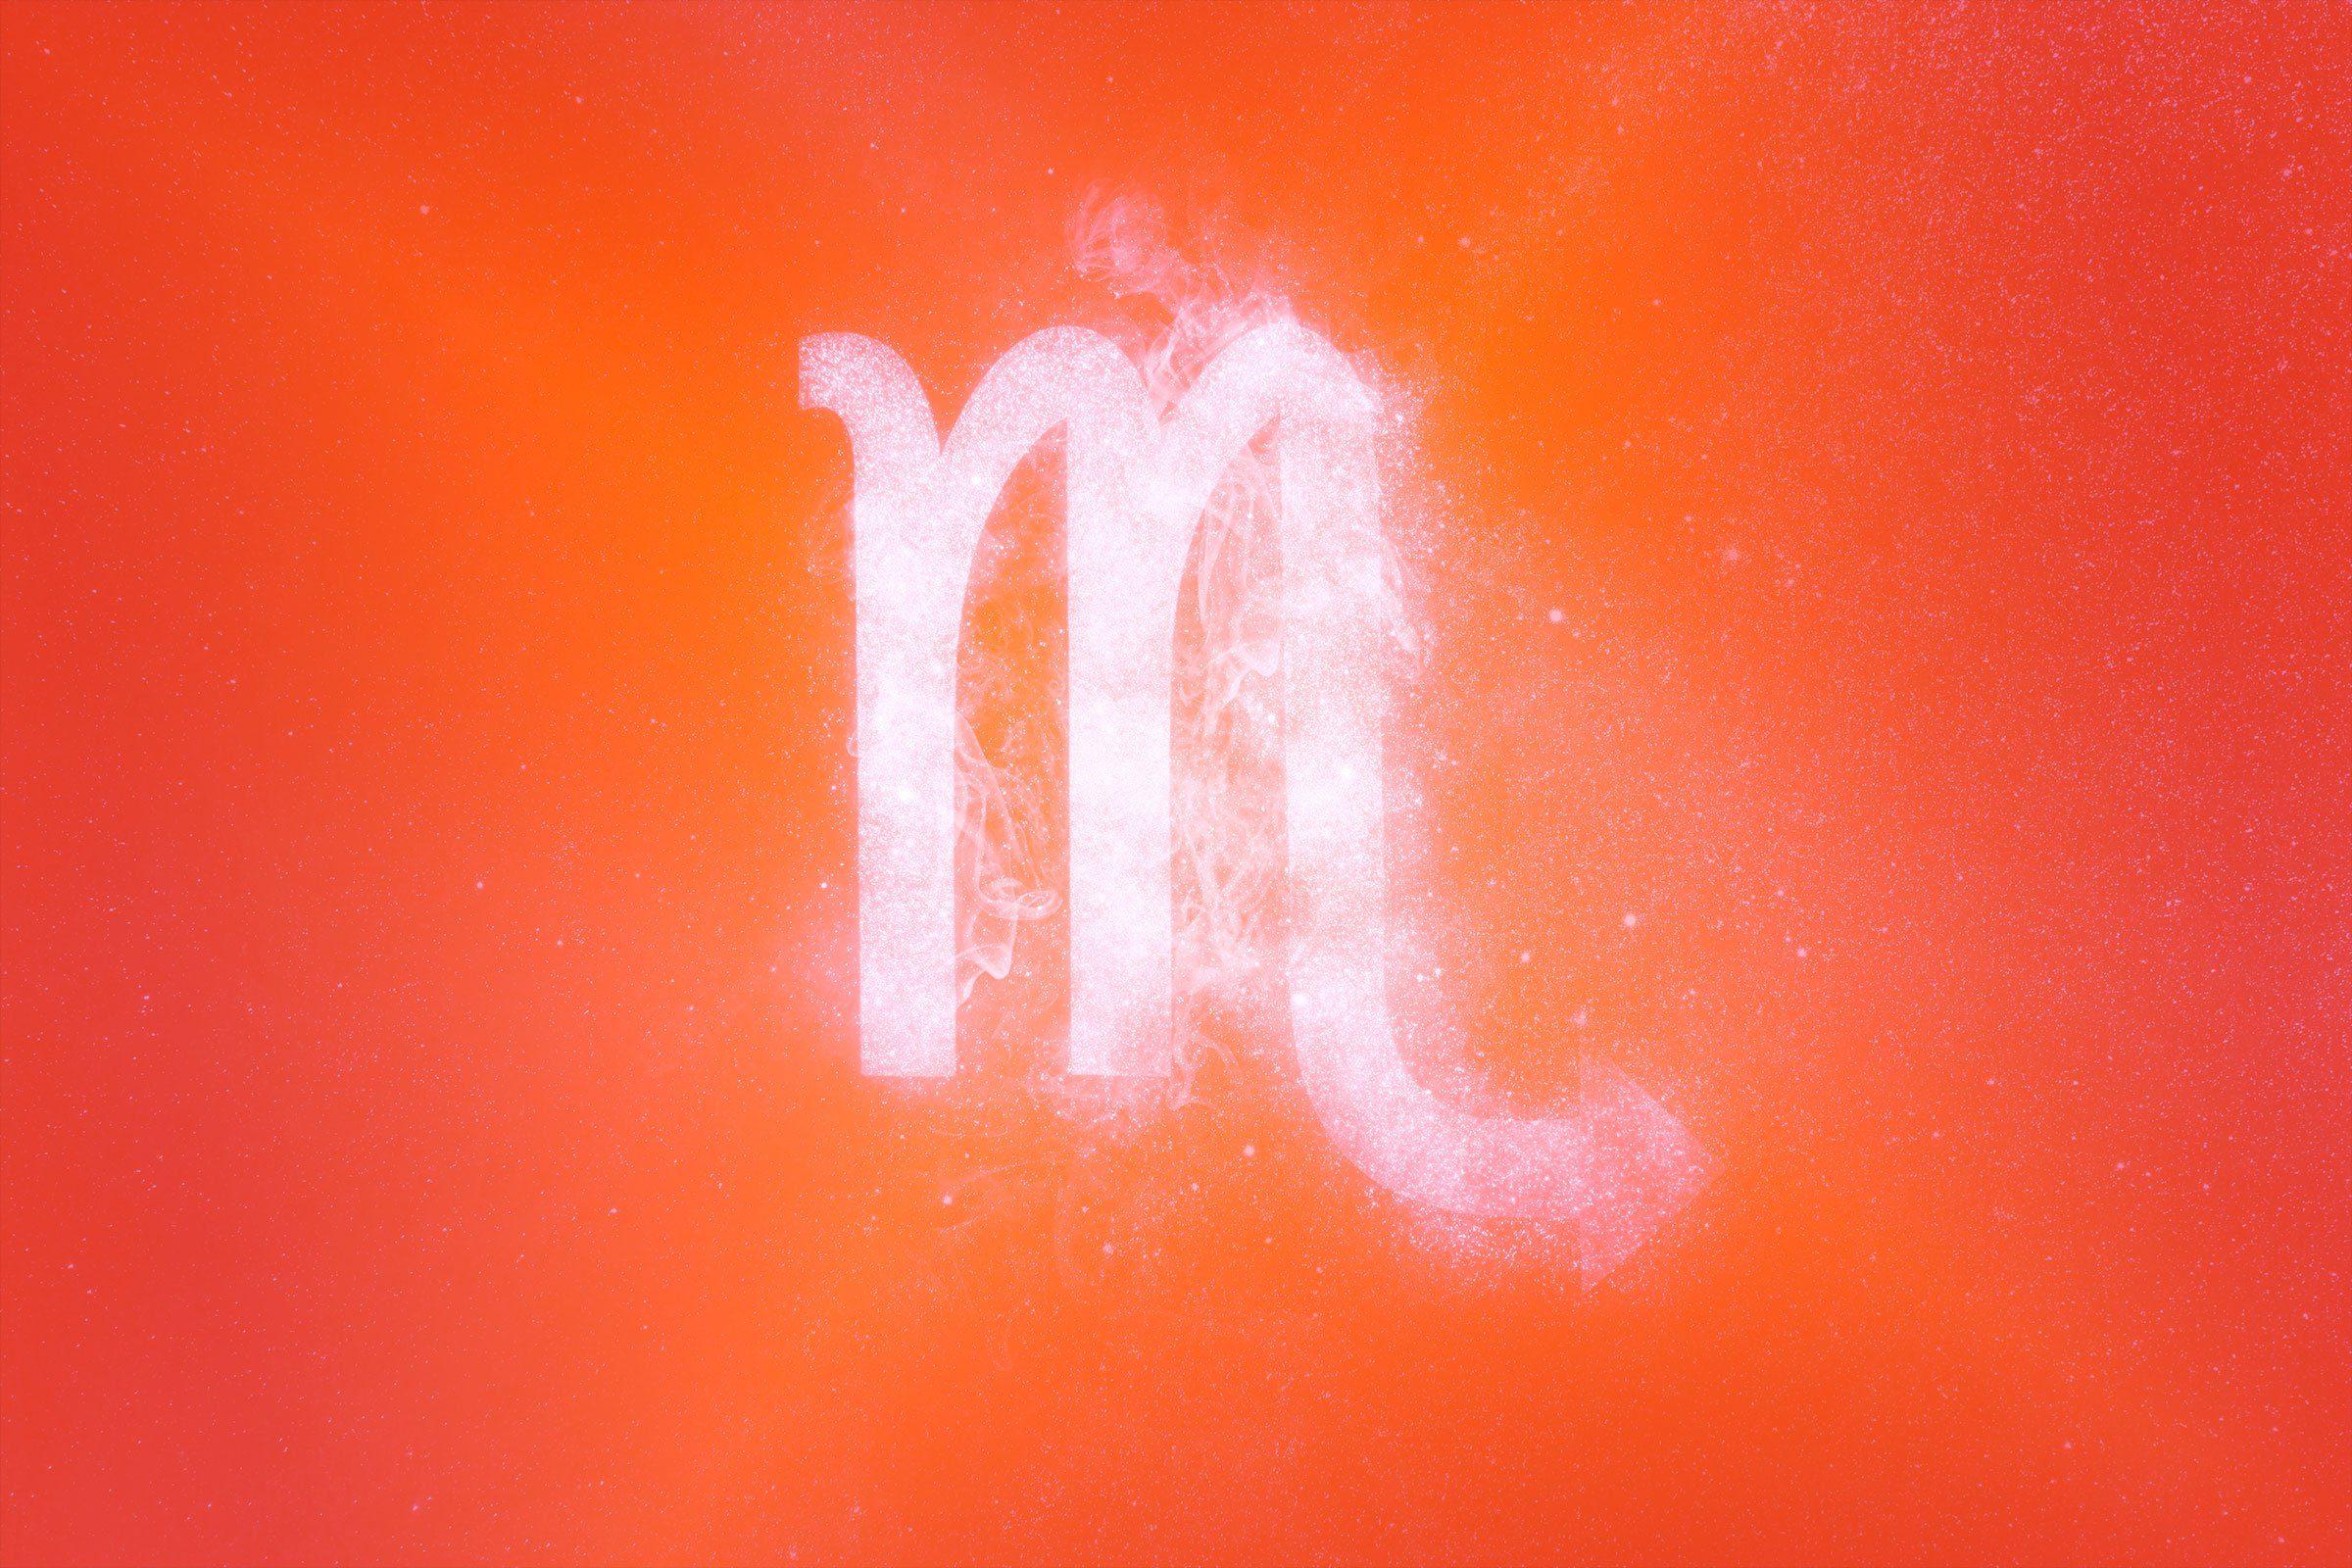 scorpio symbol with red-orange gradient overlay